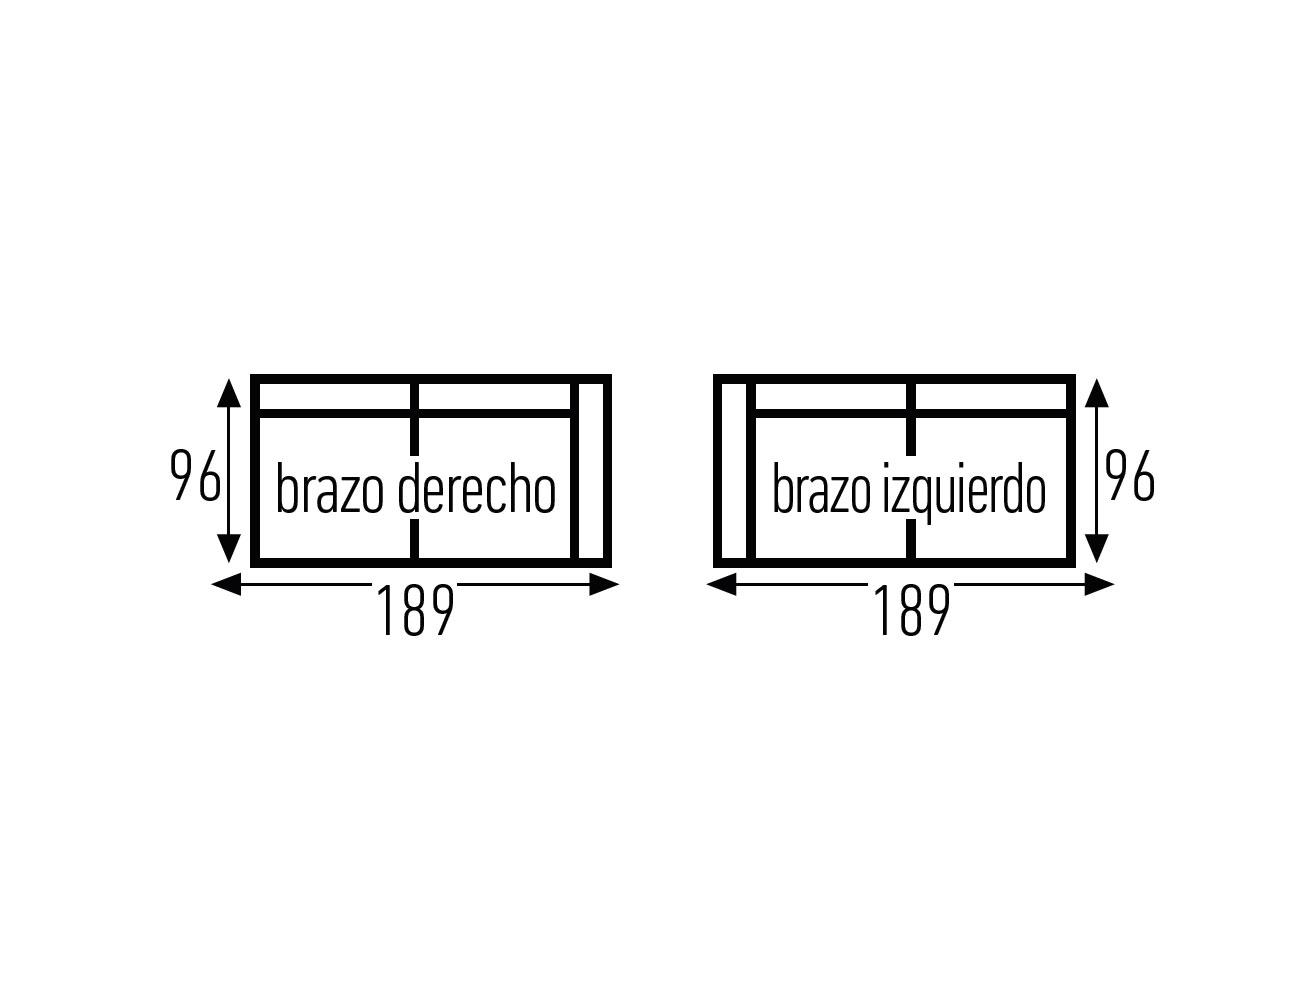 Croquis 3p sin 1 brazo 189